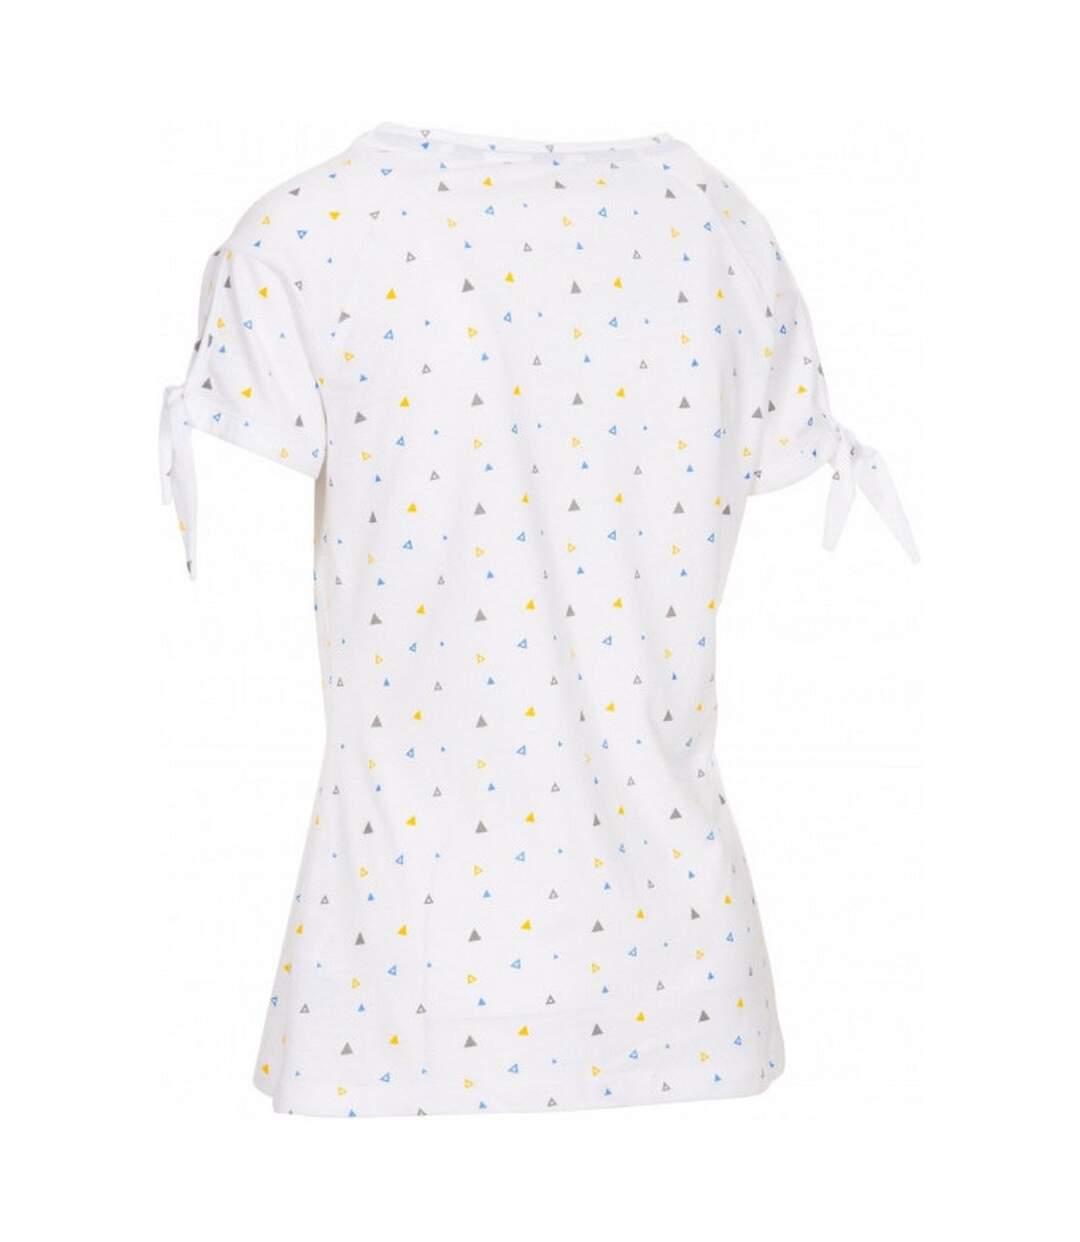 Trespass - T-Shirt Imprimé Penelope - Femme (Blanc) - UTTP4982